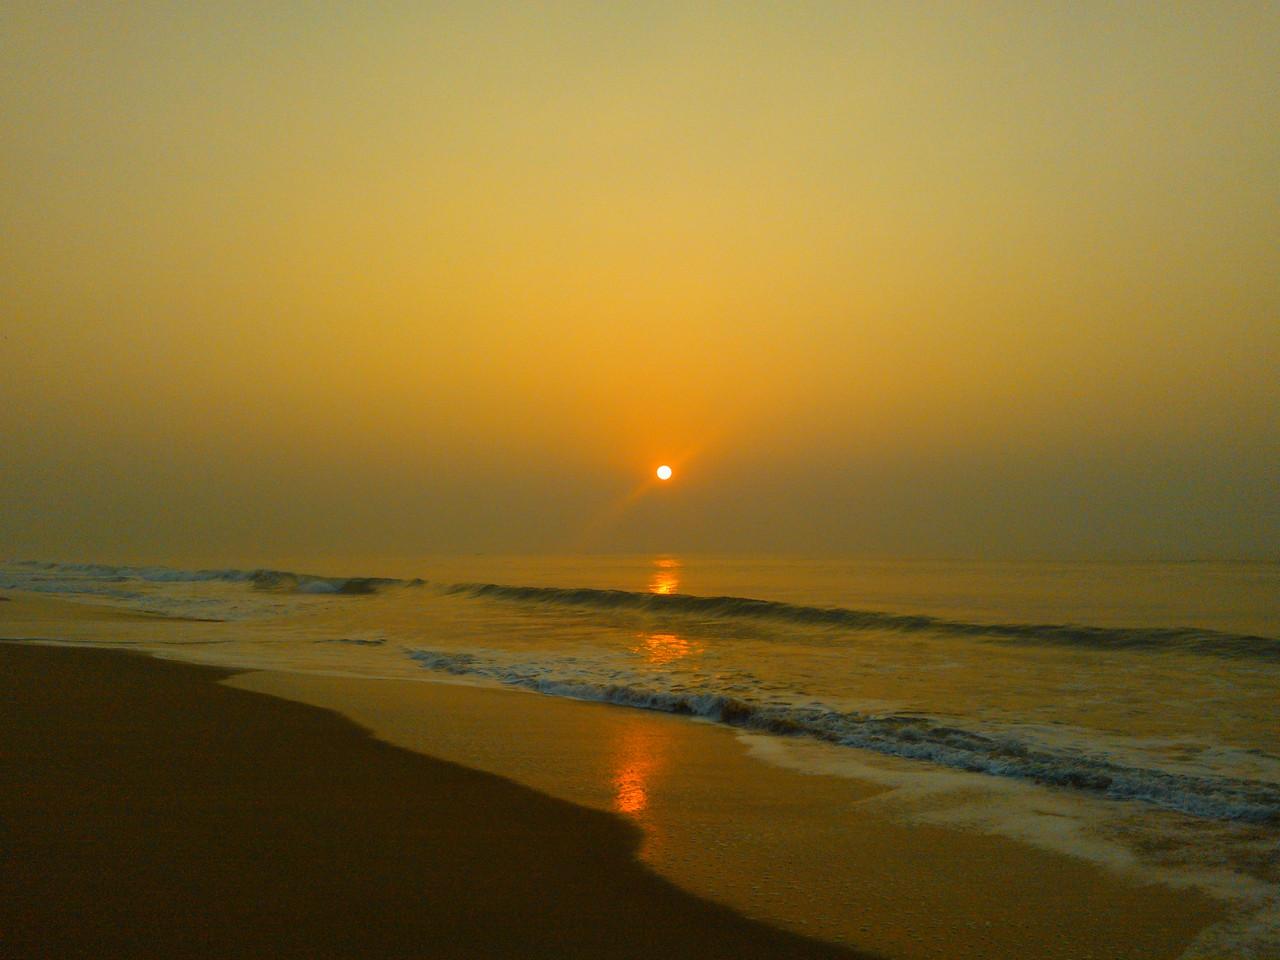 sunrise at chandrabagha beach